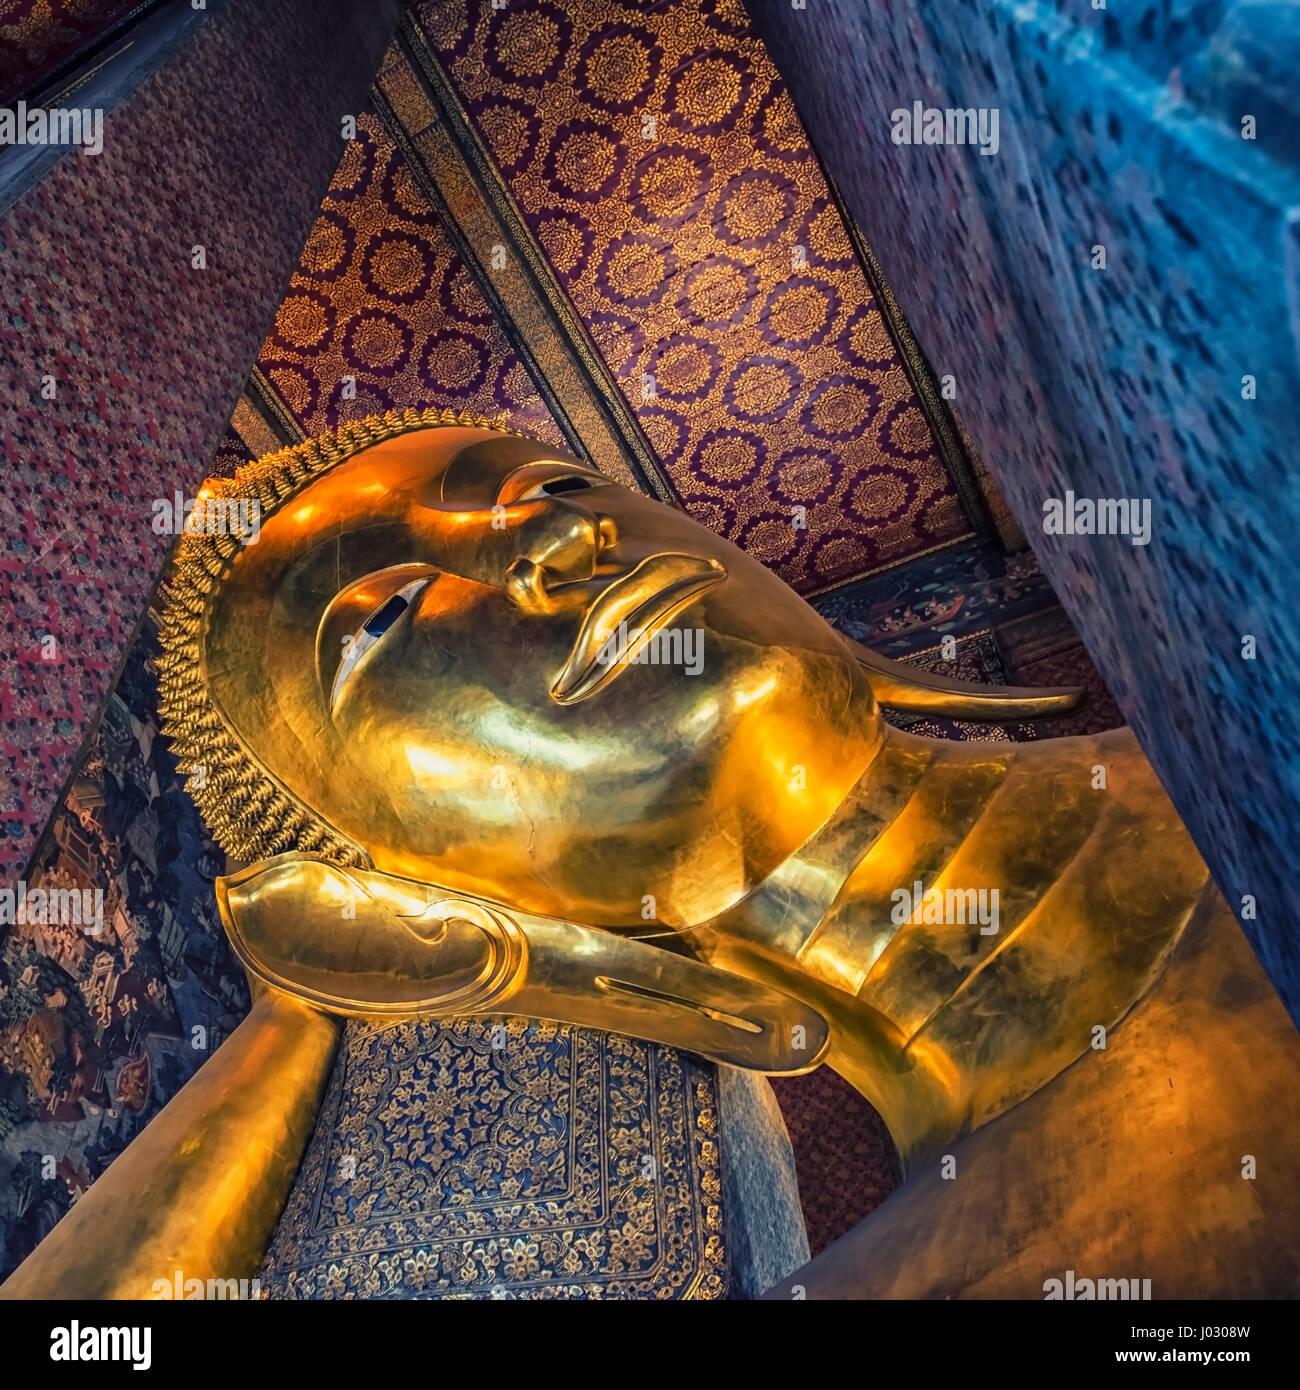 Reclining buddha in Wat Pho temple, Bangkok - Stock Image